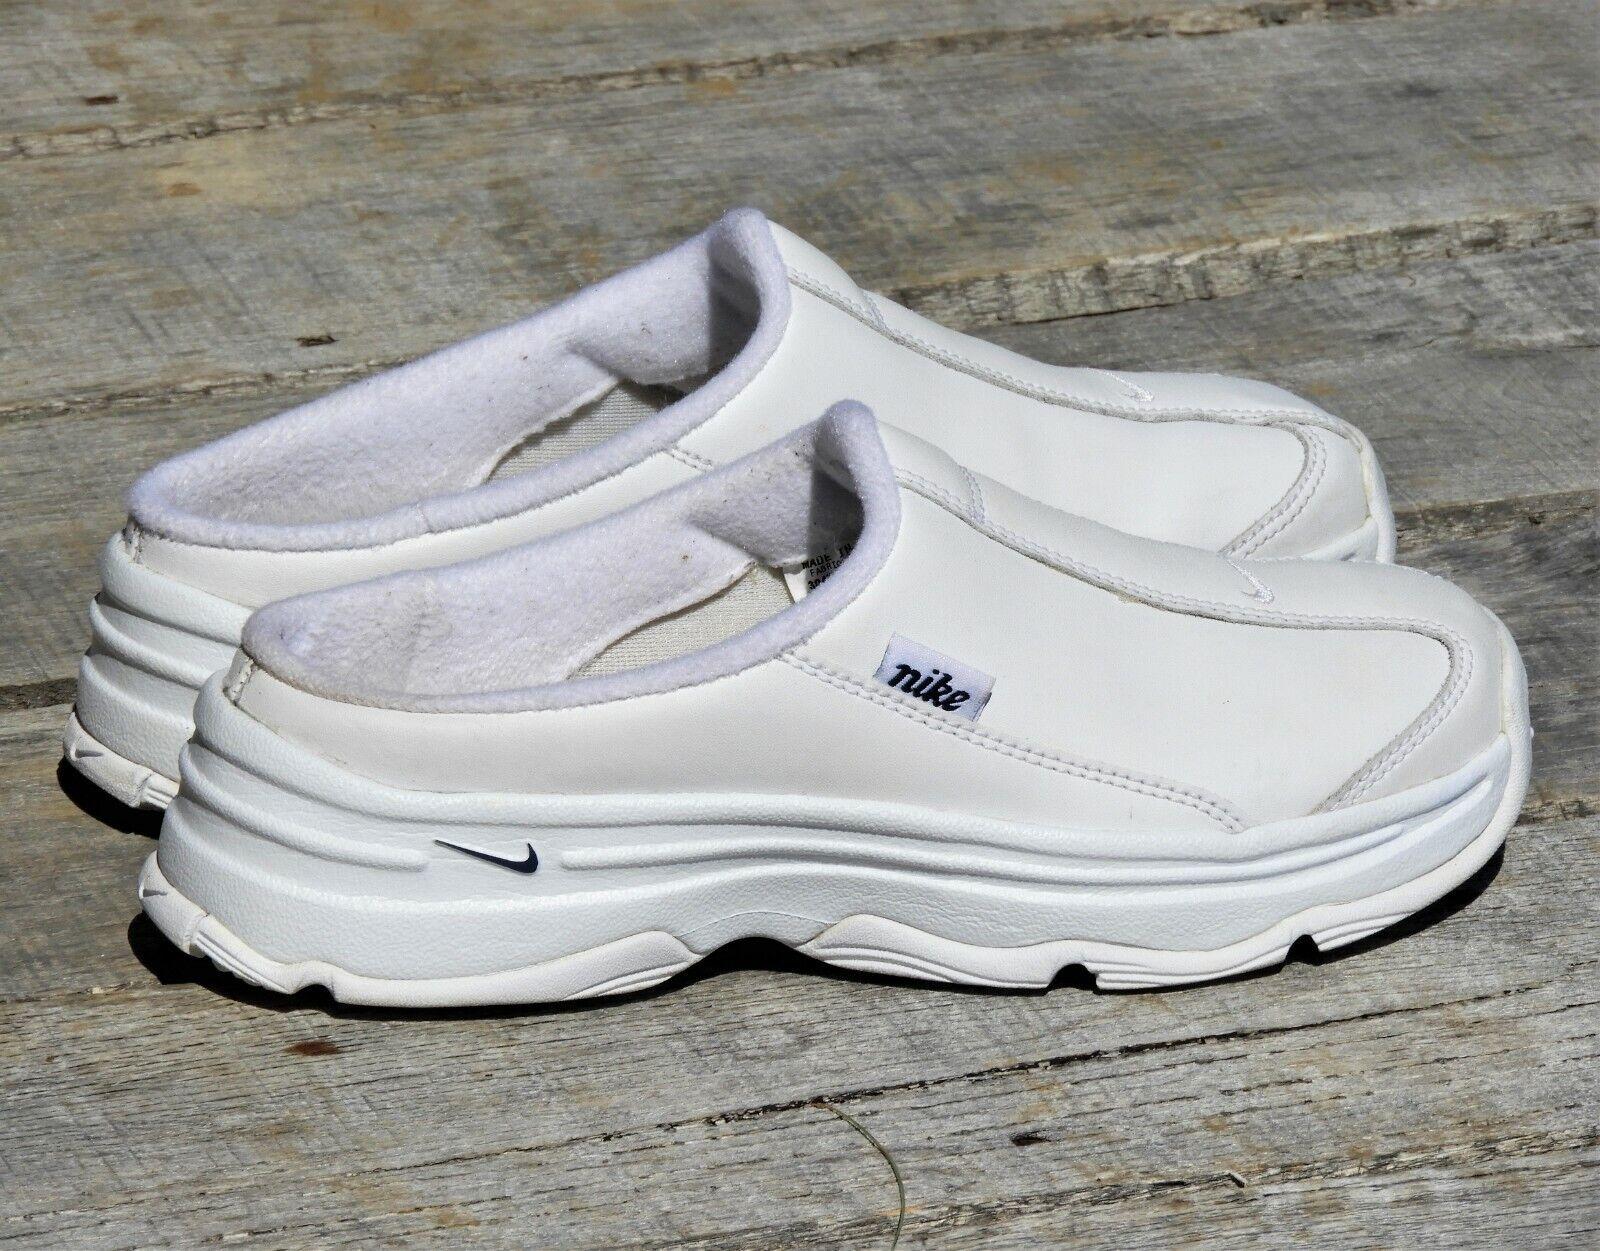 Nike Women's 7.5 Chunky Heel shoes Nurse Slipons 304582 White Leather 08 2006